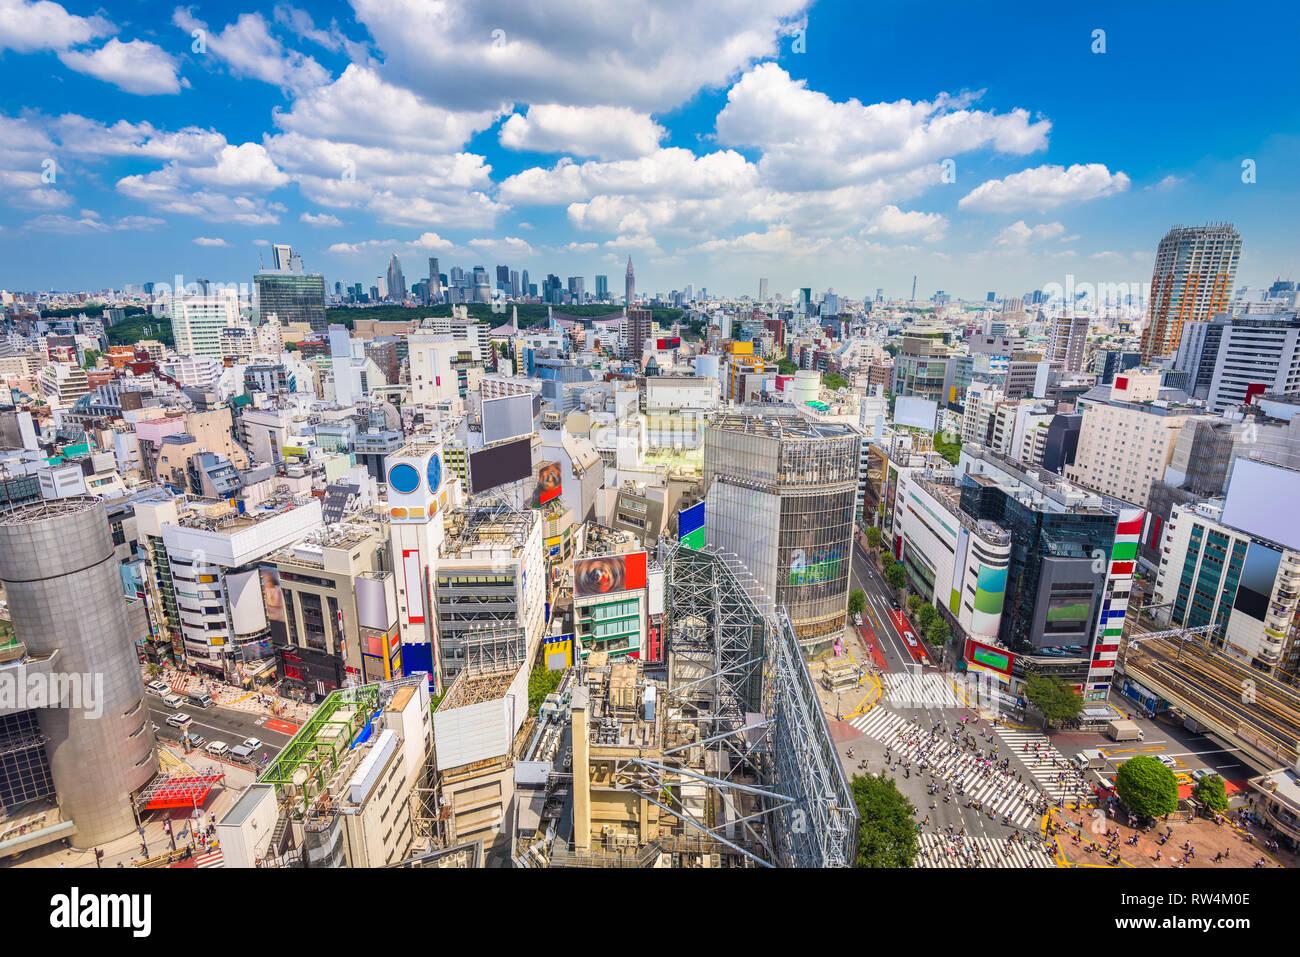 Shibuya, Tokyo, Japan city skyline over Shibuya Scramble Crosswalk in the afternoon. - Stock Image